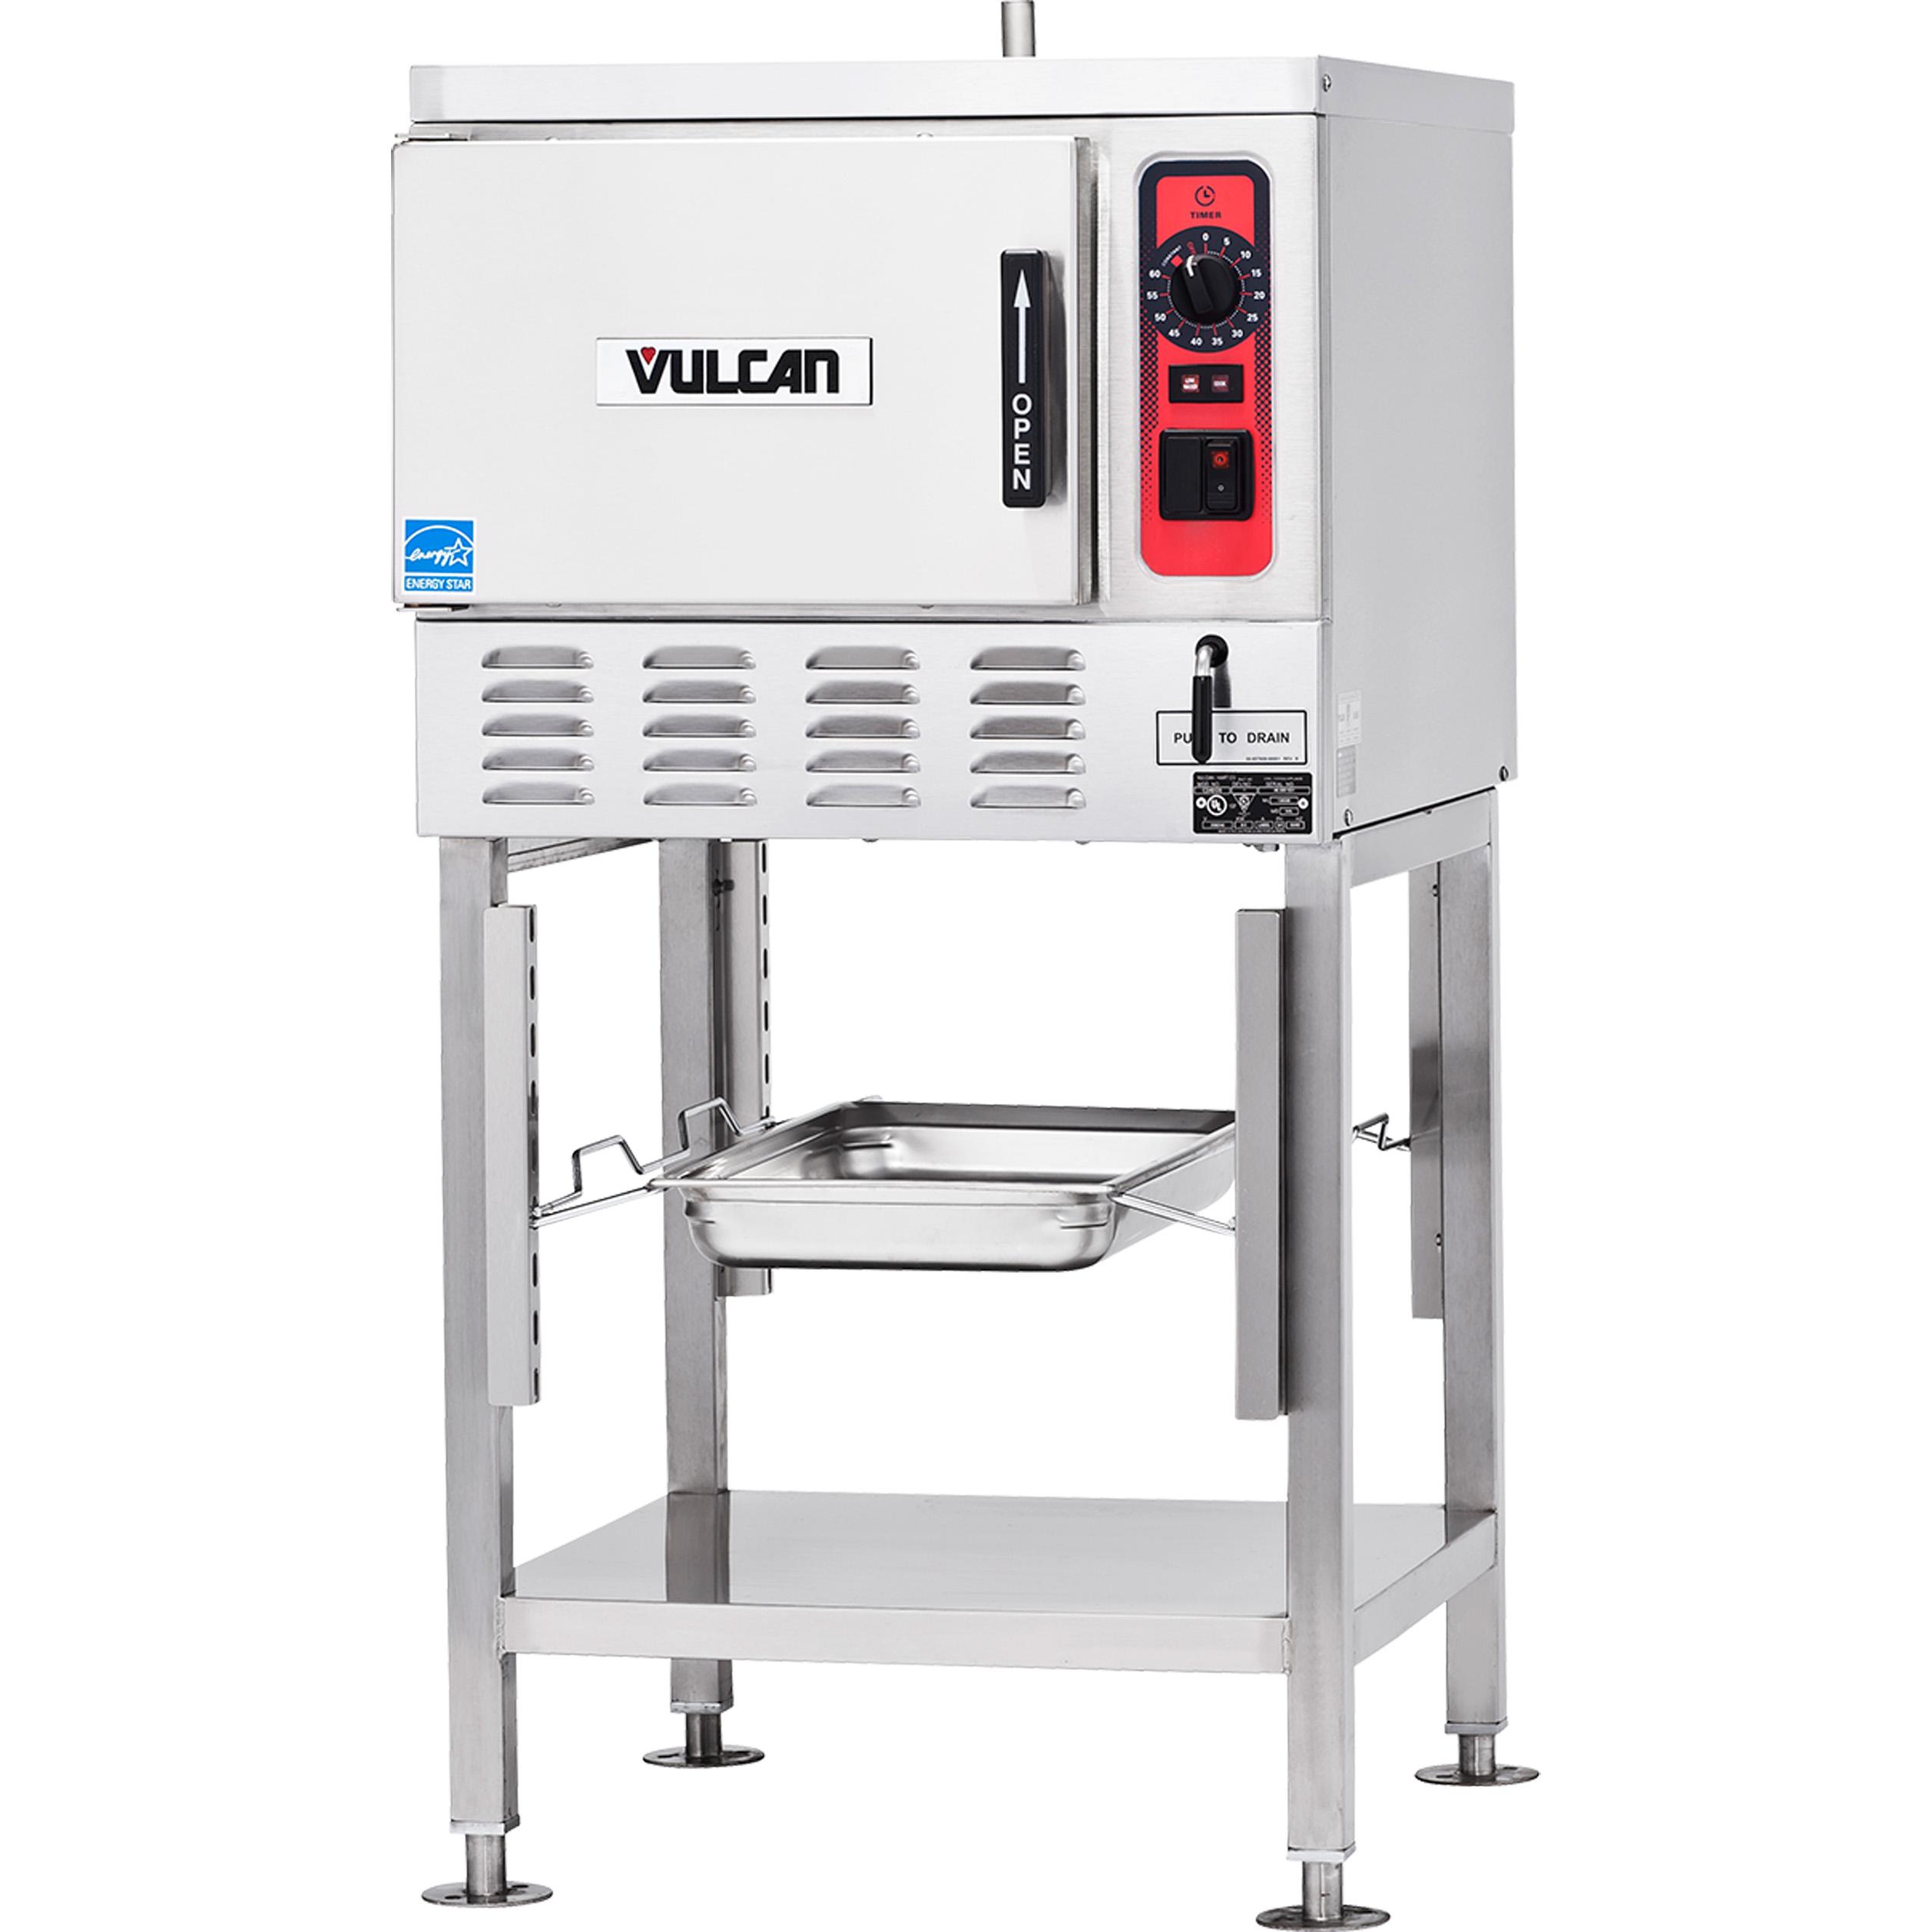 Vulcan C24EO5 steamer, convection, boilerless, countertop